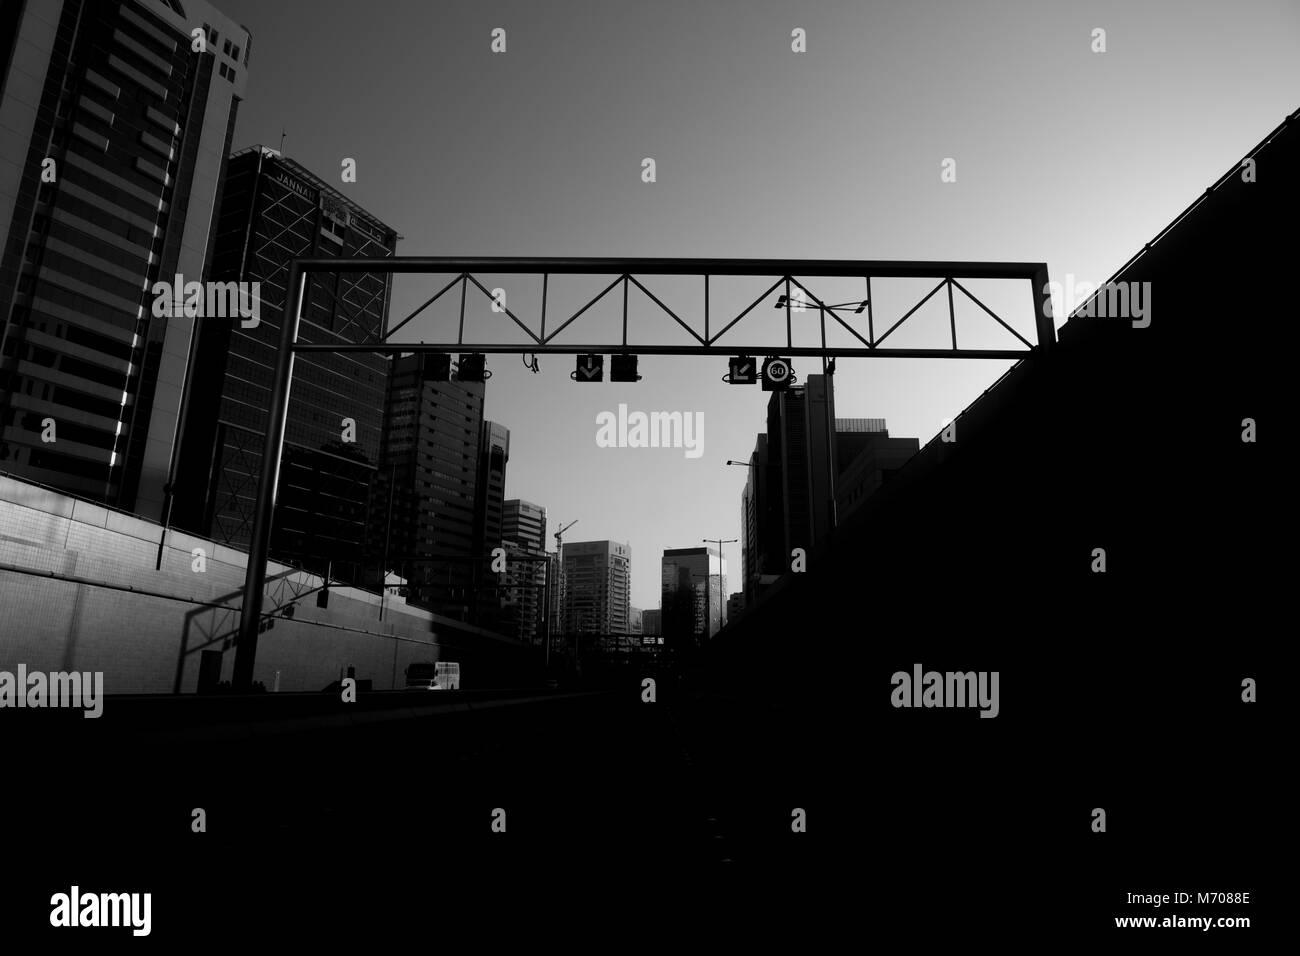 Abu Dhabi City - Stock Image